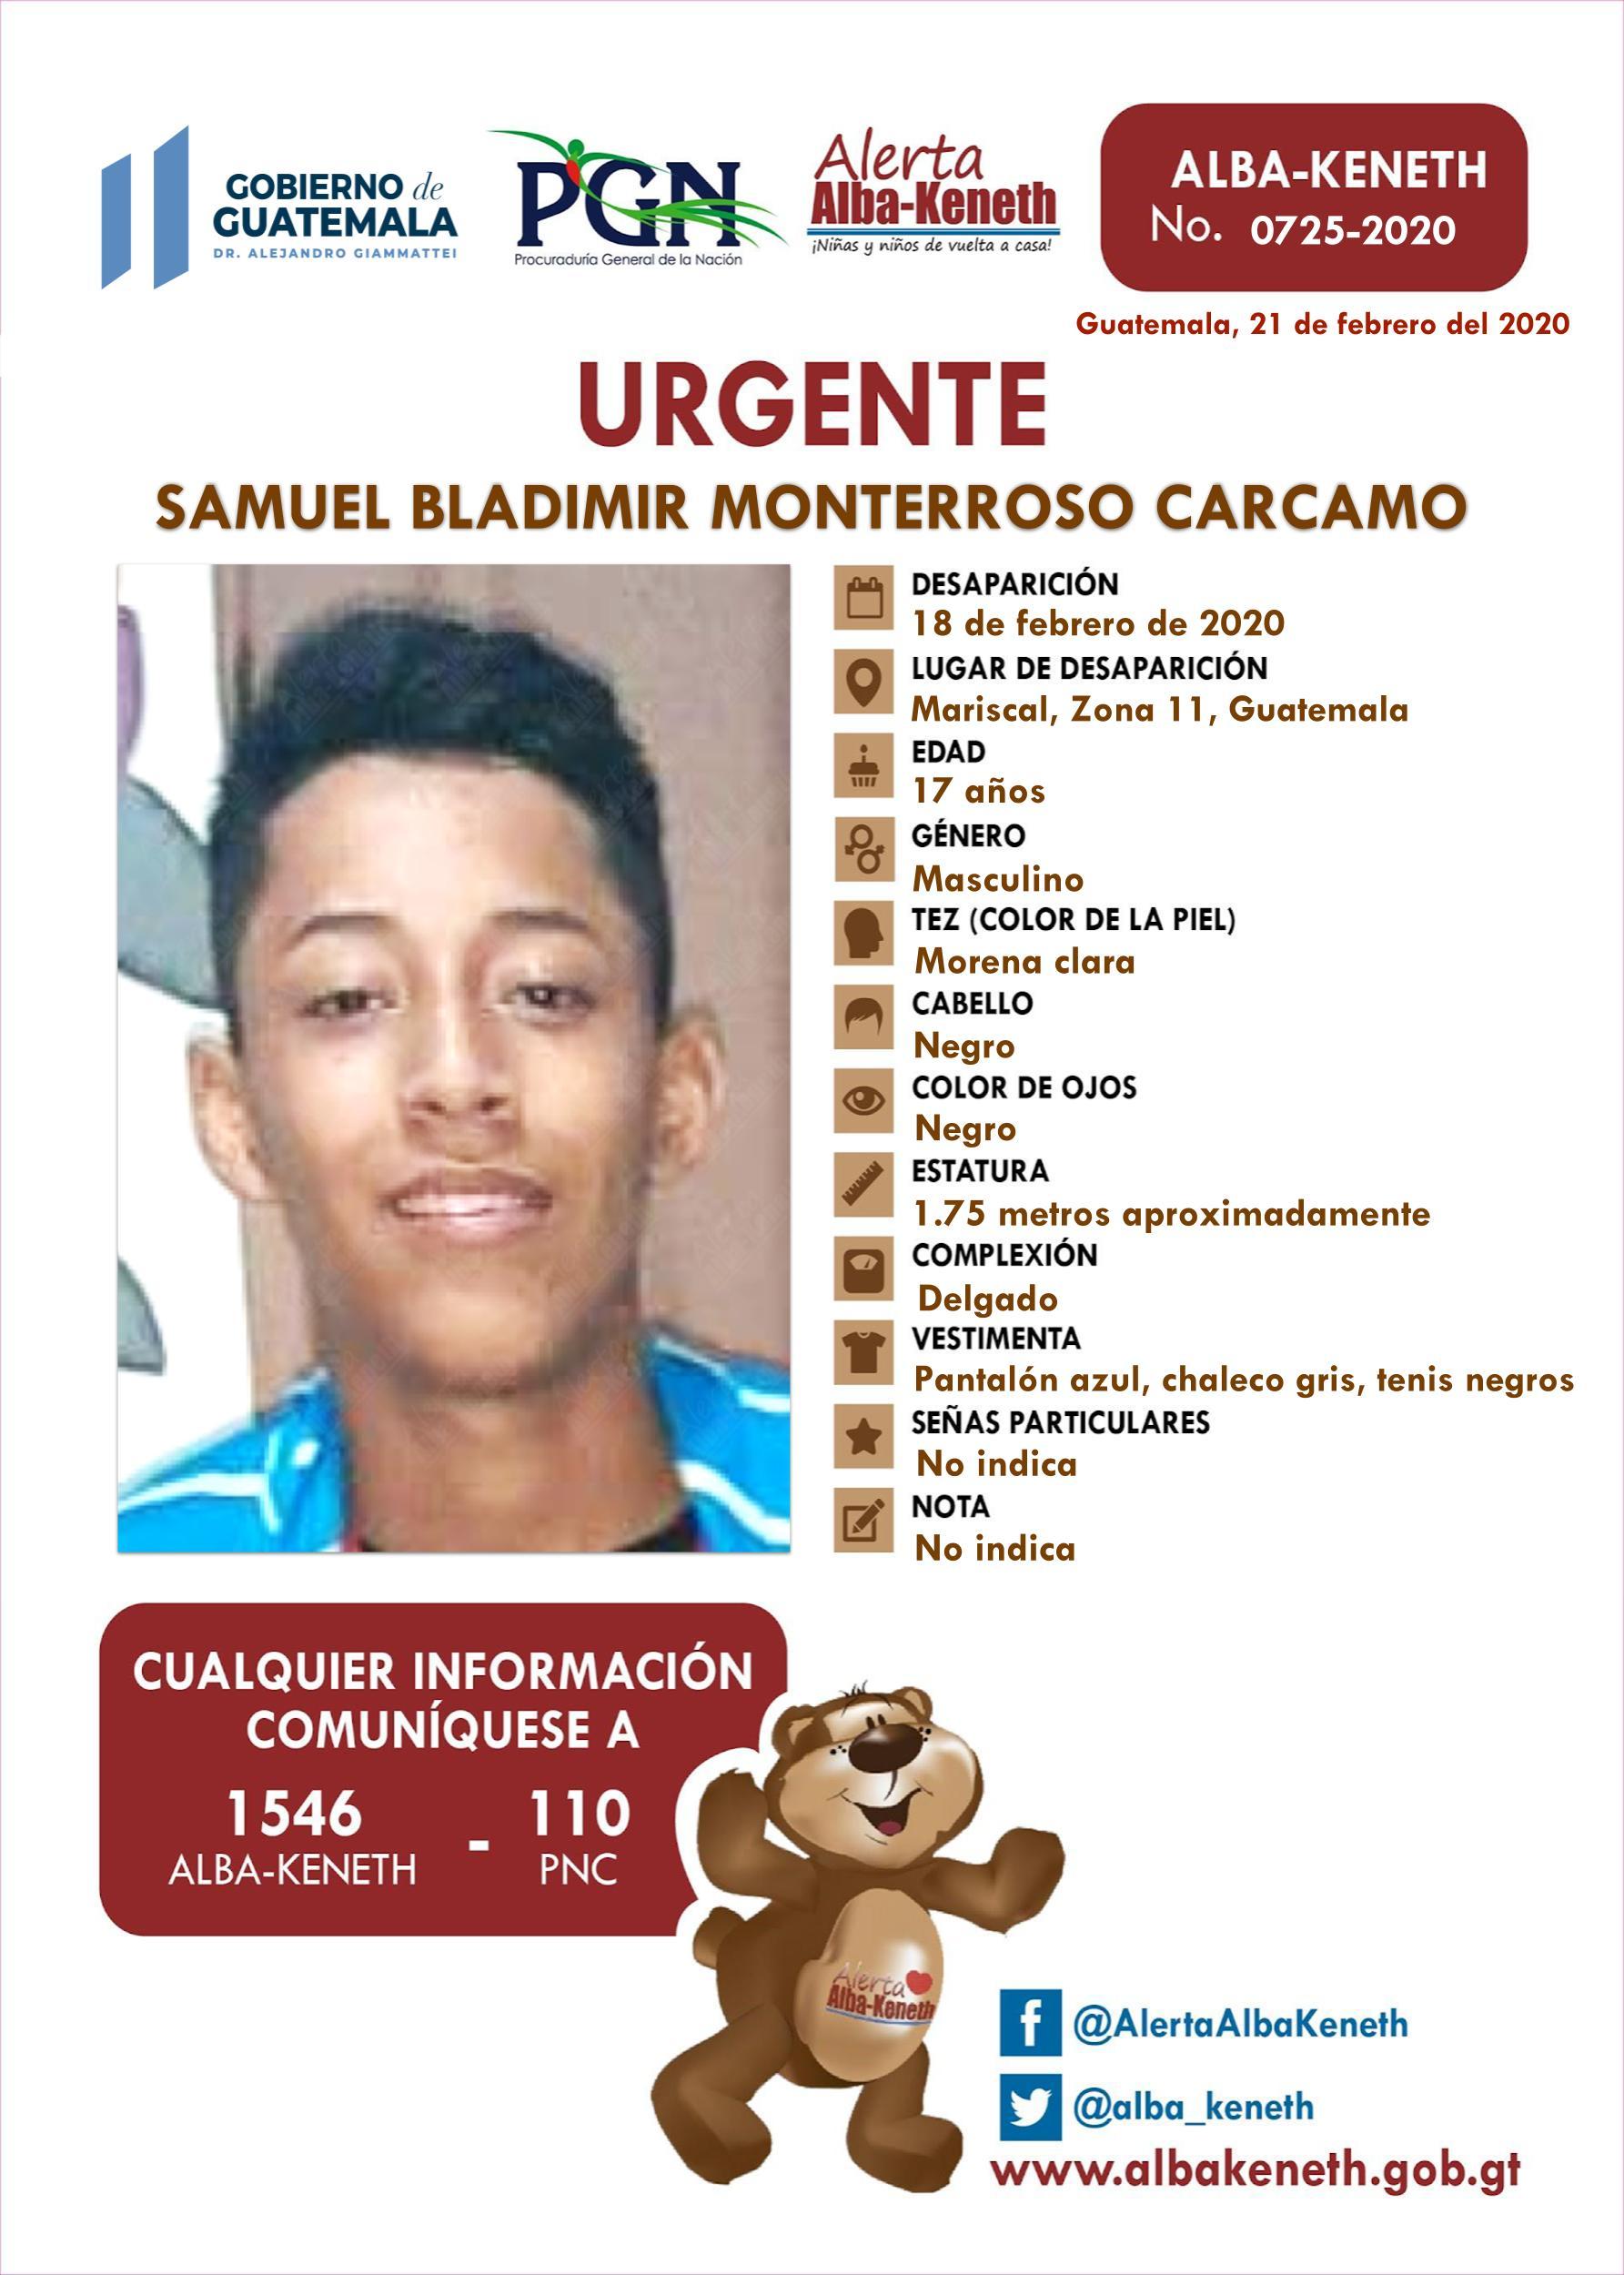 Samuel Bladimir Monterroso Carcamo